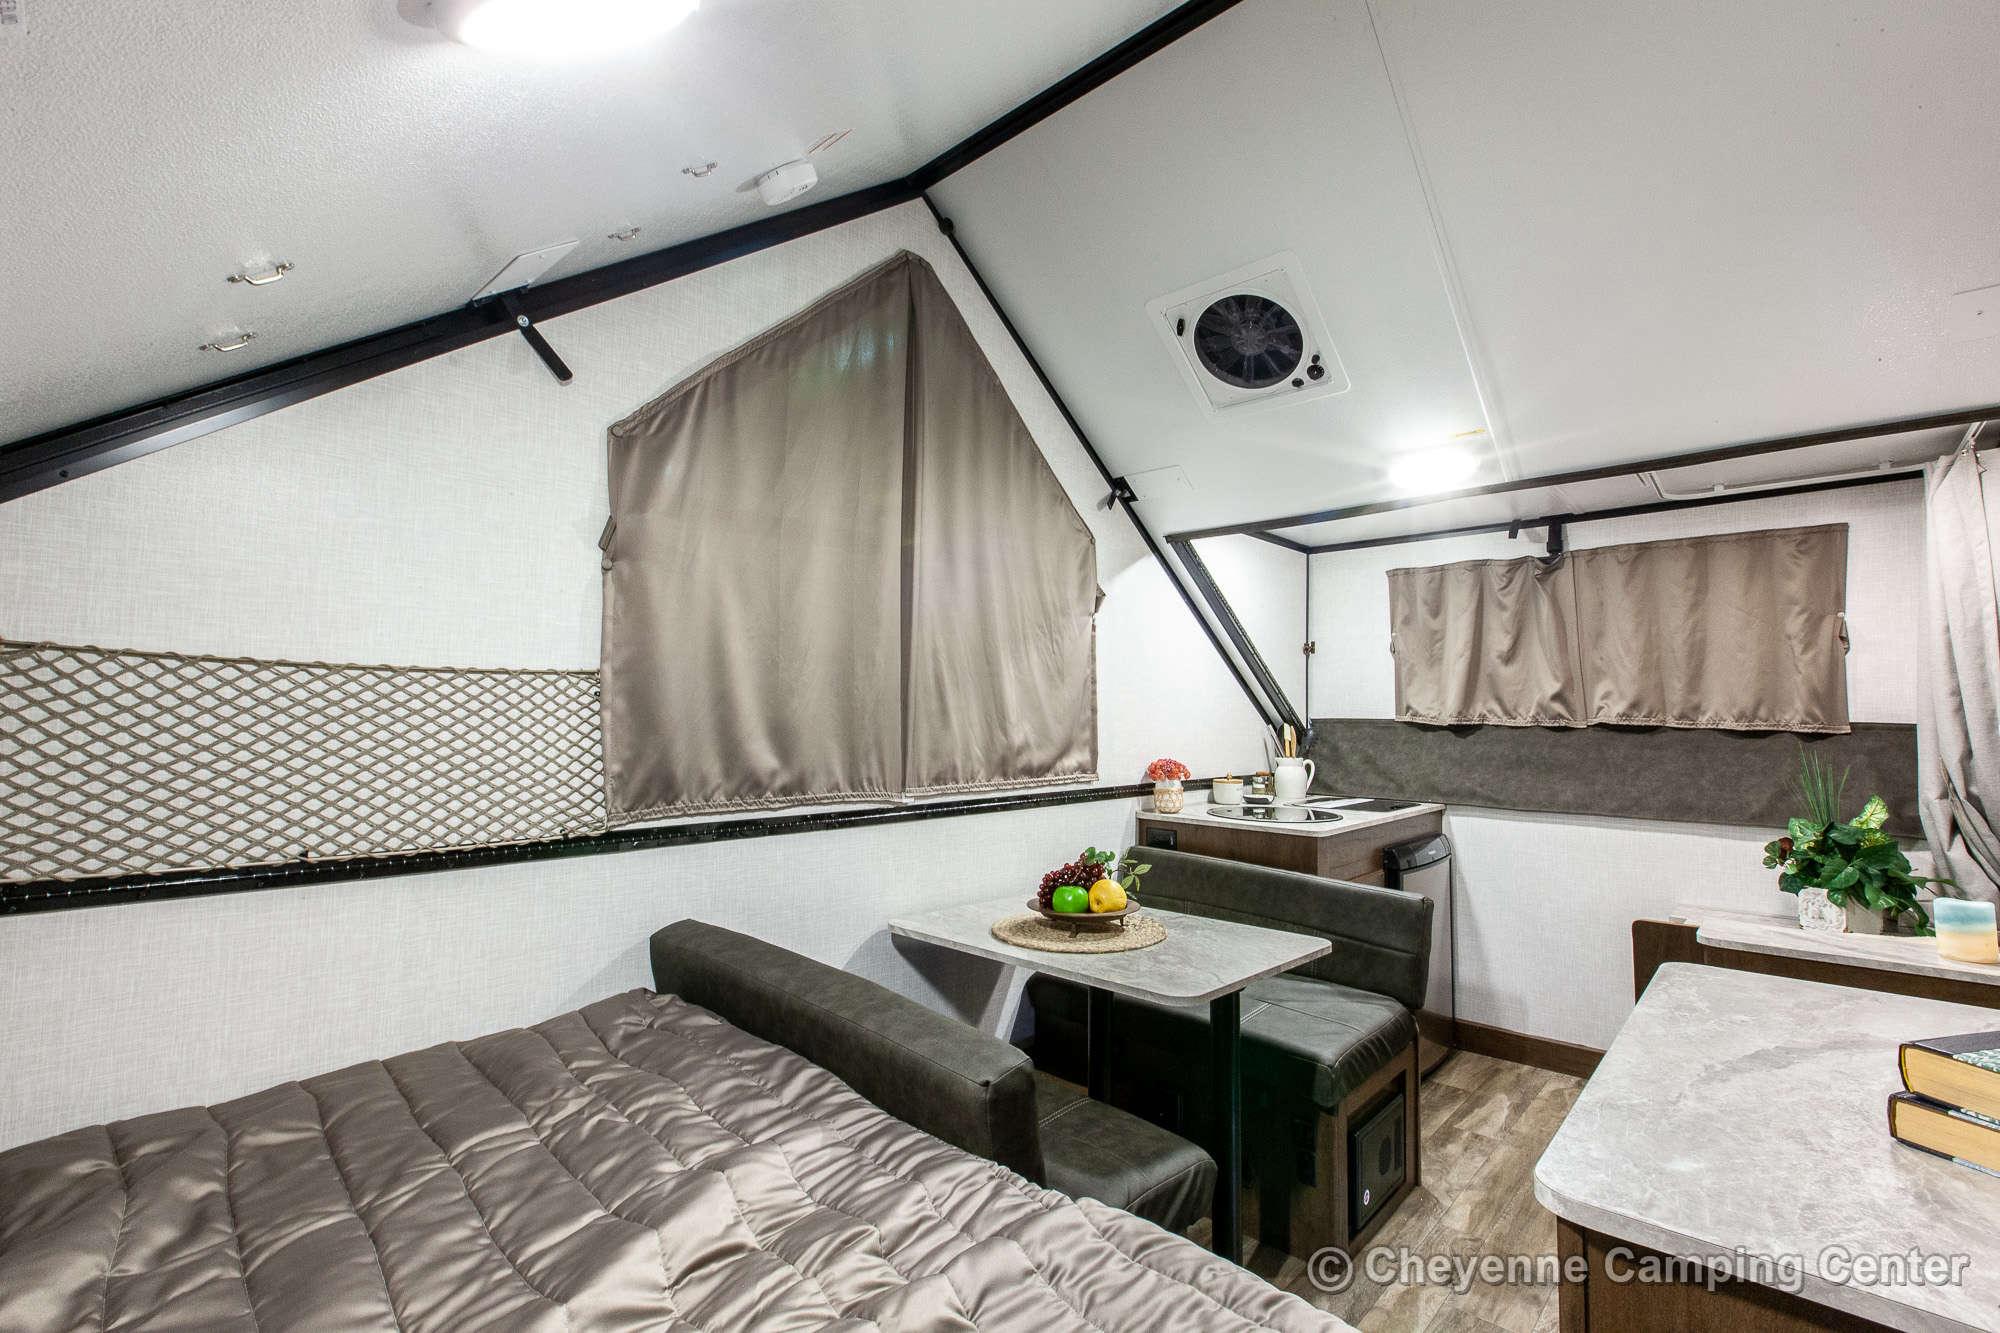 2021 Forest River Flagstaff Hard Side T21DMHW Folding Camper Interior Image